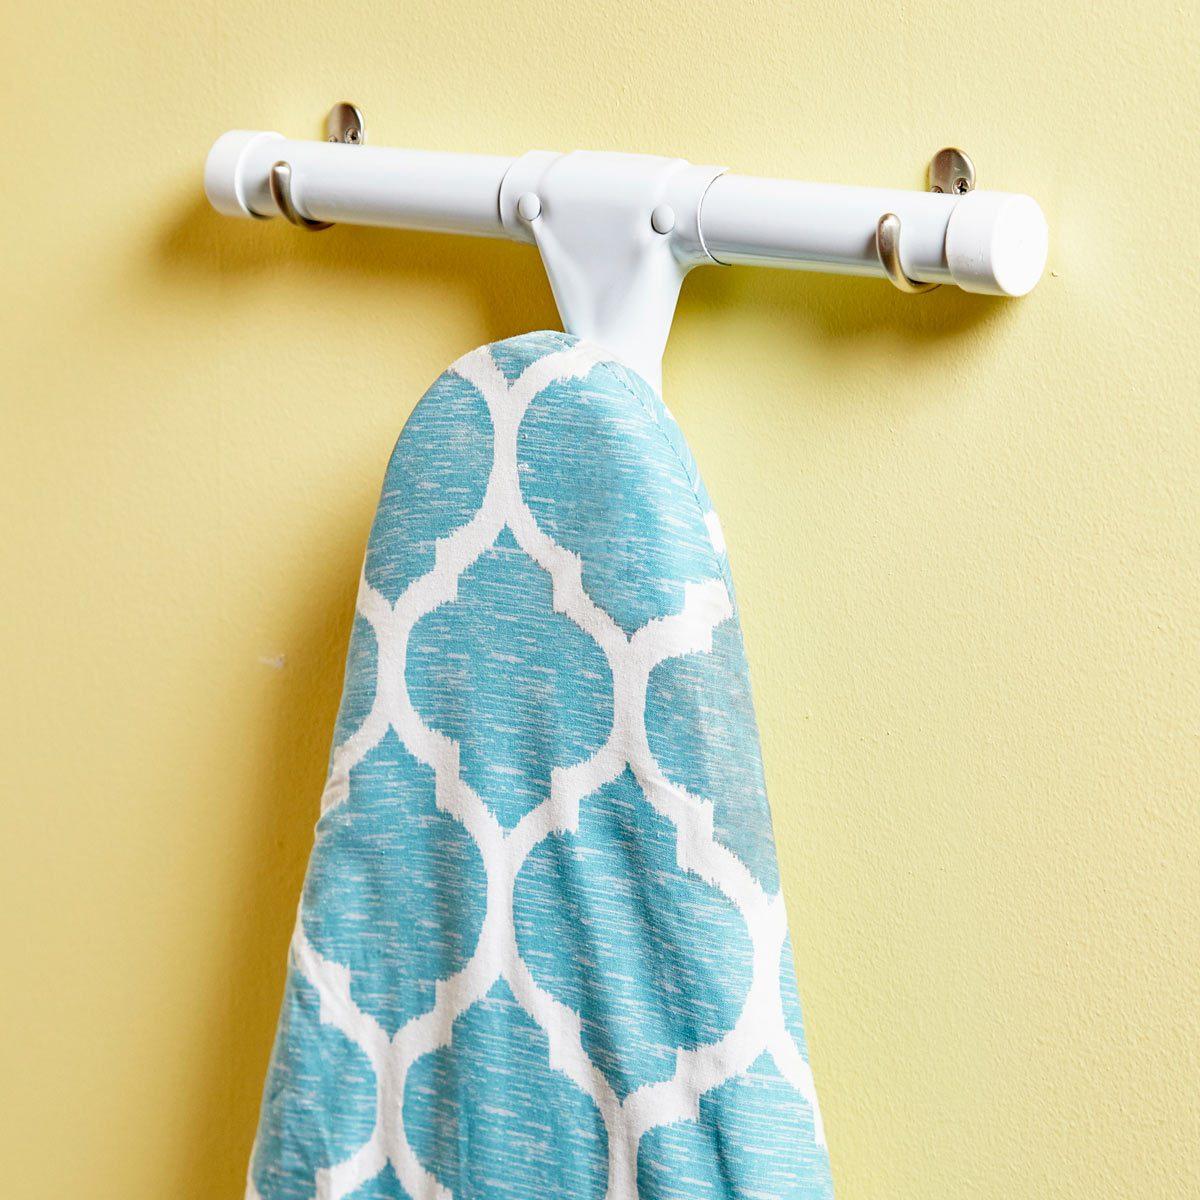 HH ironing board holder